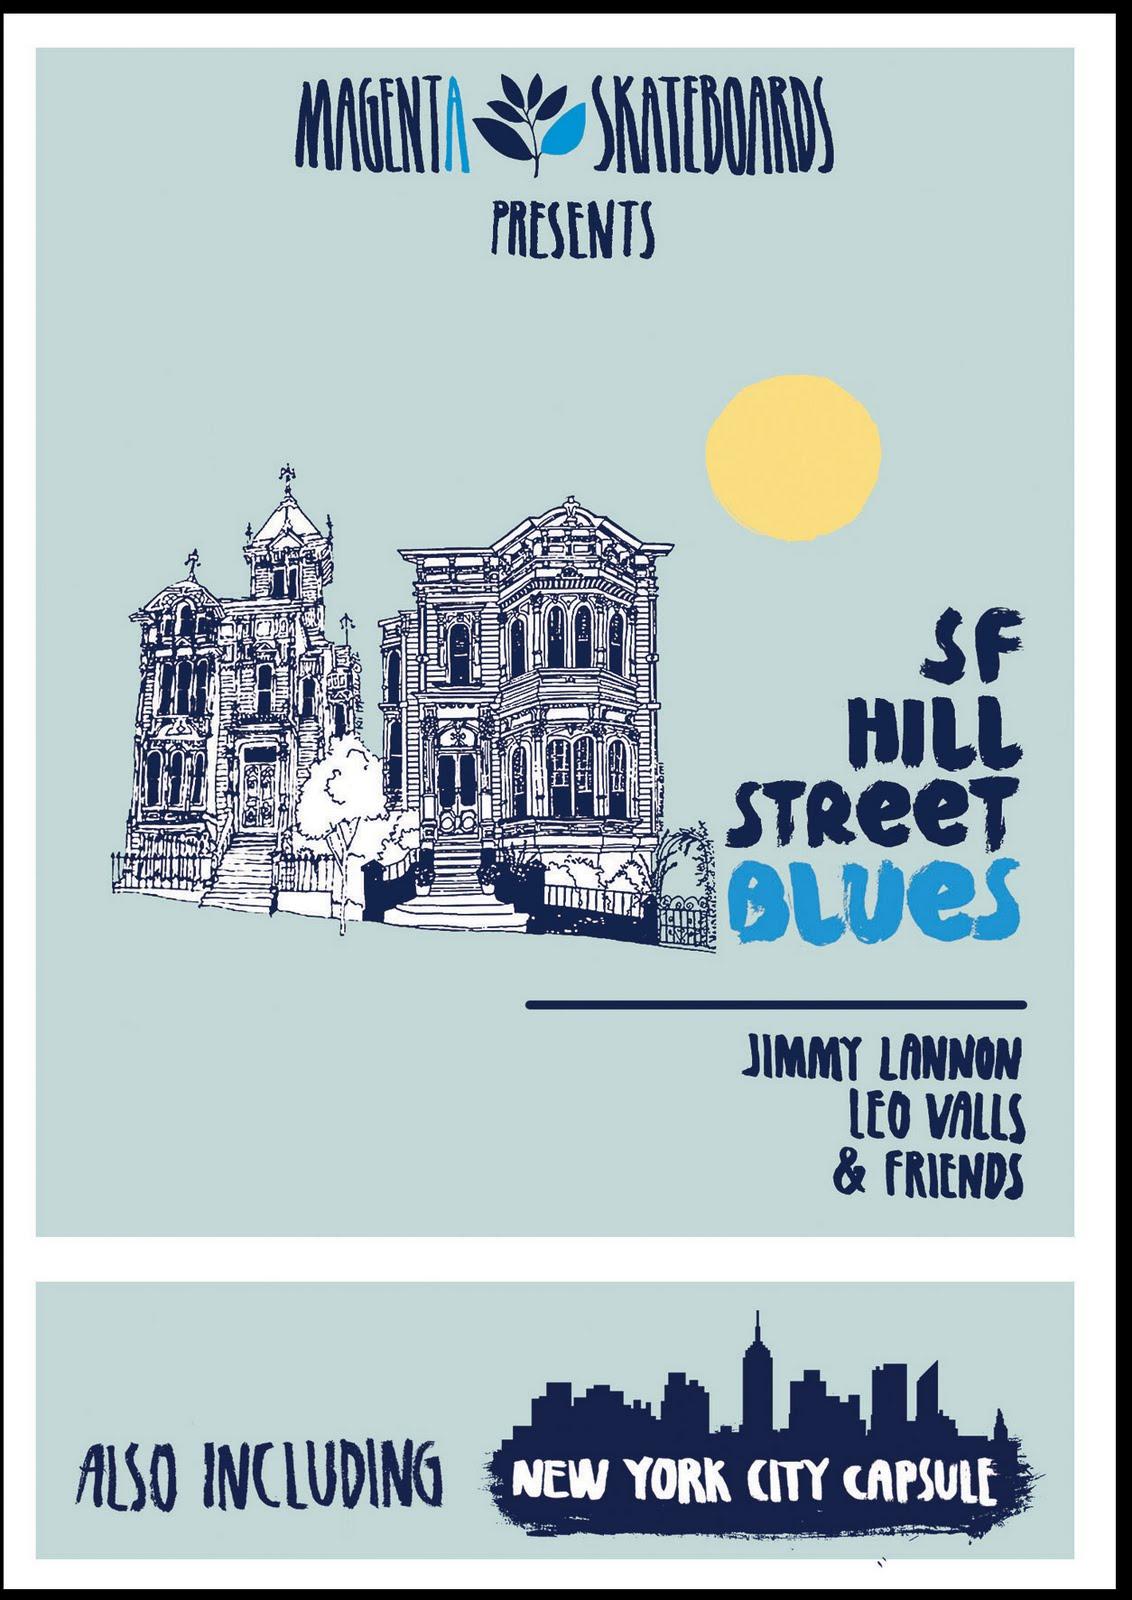 SF HILL STREET BLUES - DVD COVER